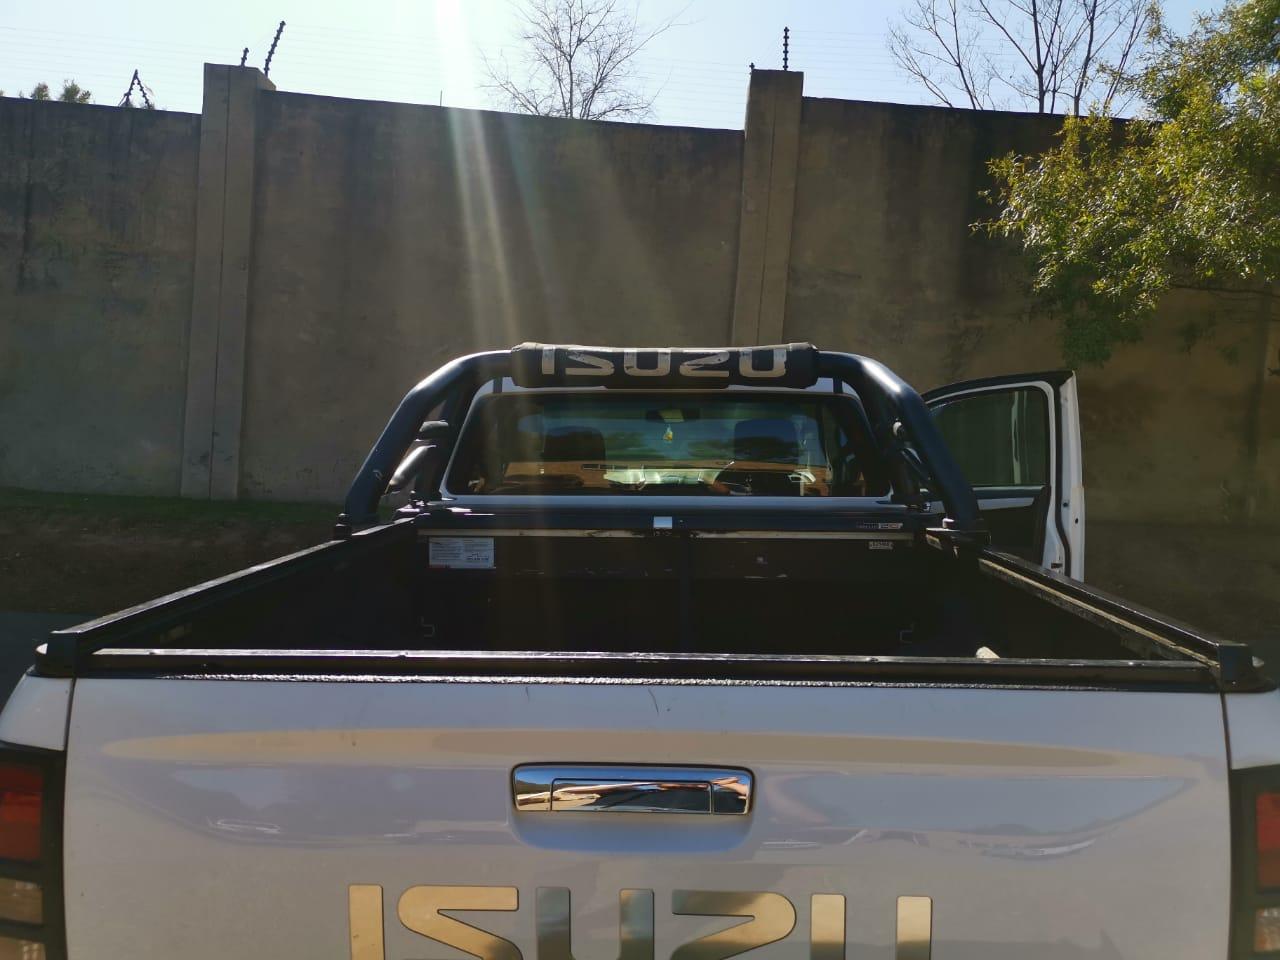 Ex cab Securi-lid with original Isuzu rol bar and cover for 2017 Isuzu